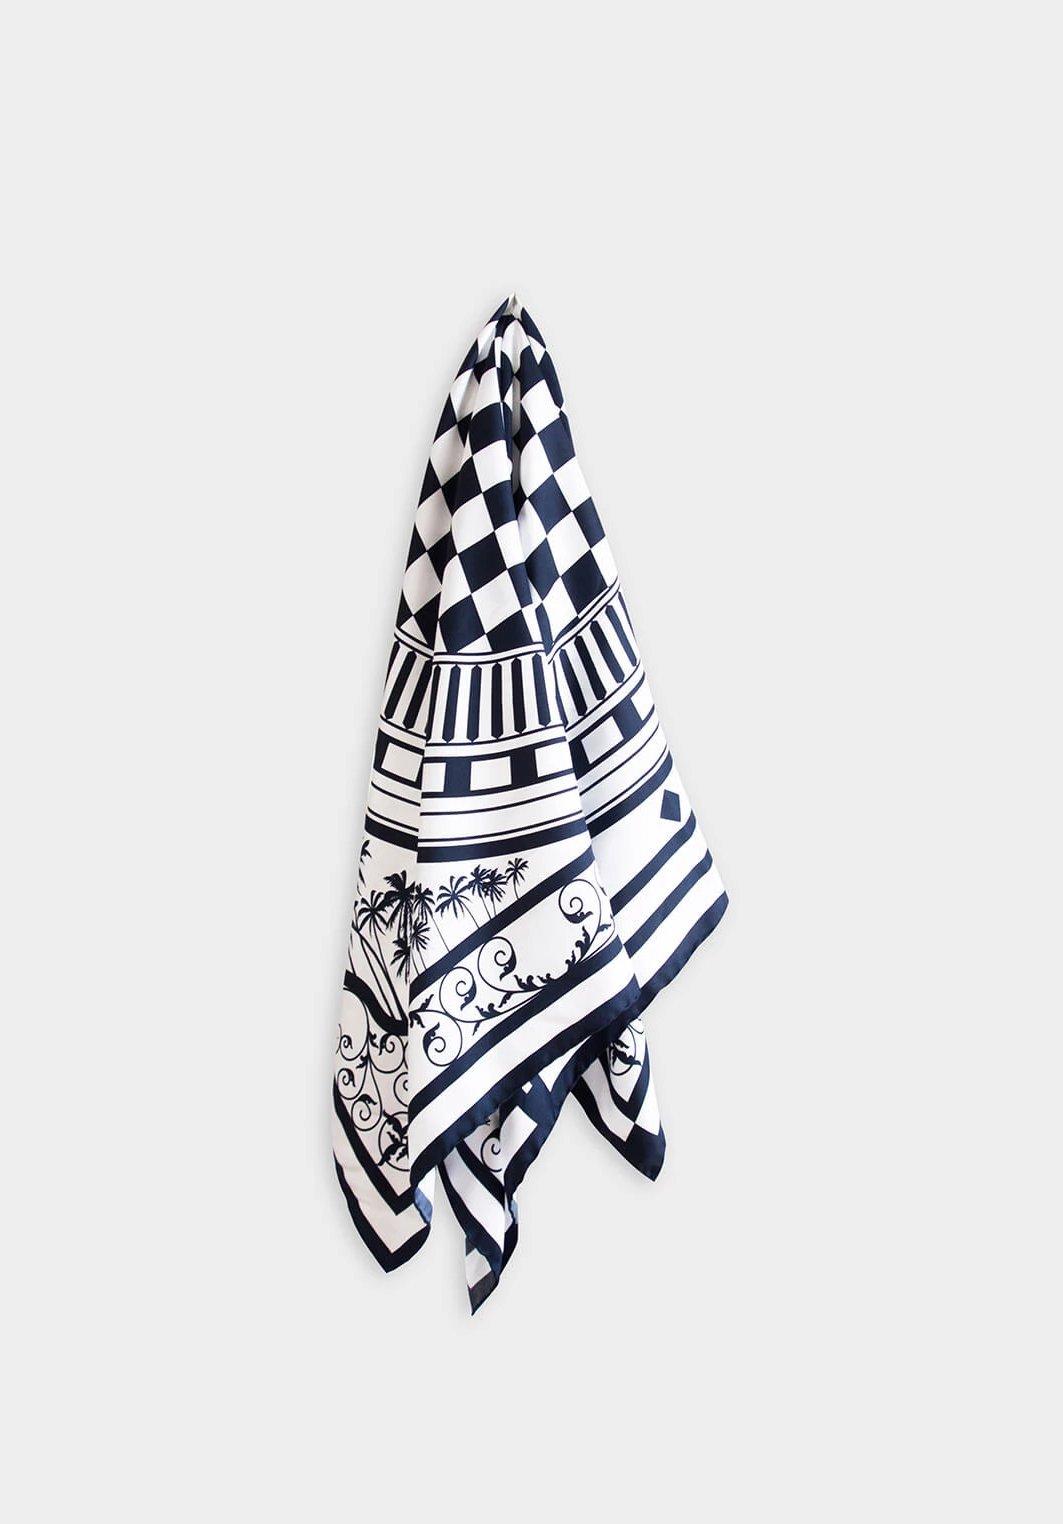 Eastern & Oriental Silk Scarf, Black White by Nonamu on curated-crowd.com